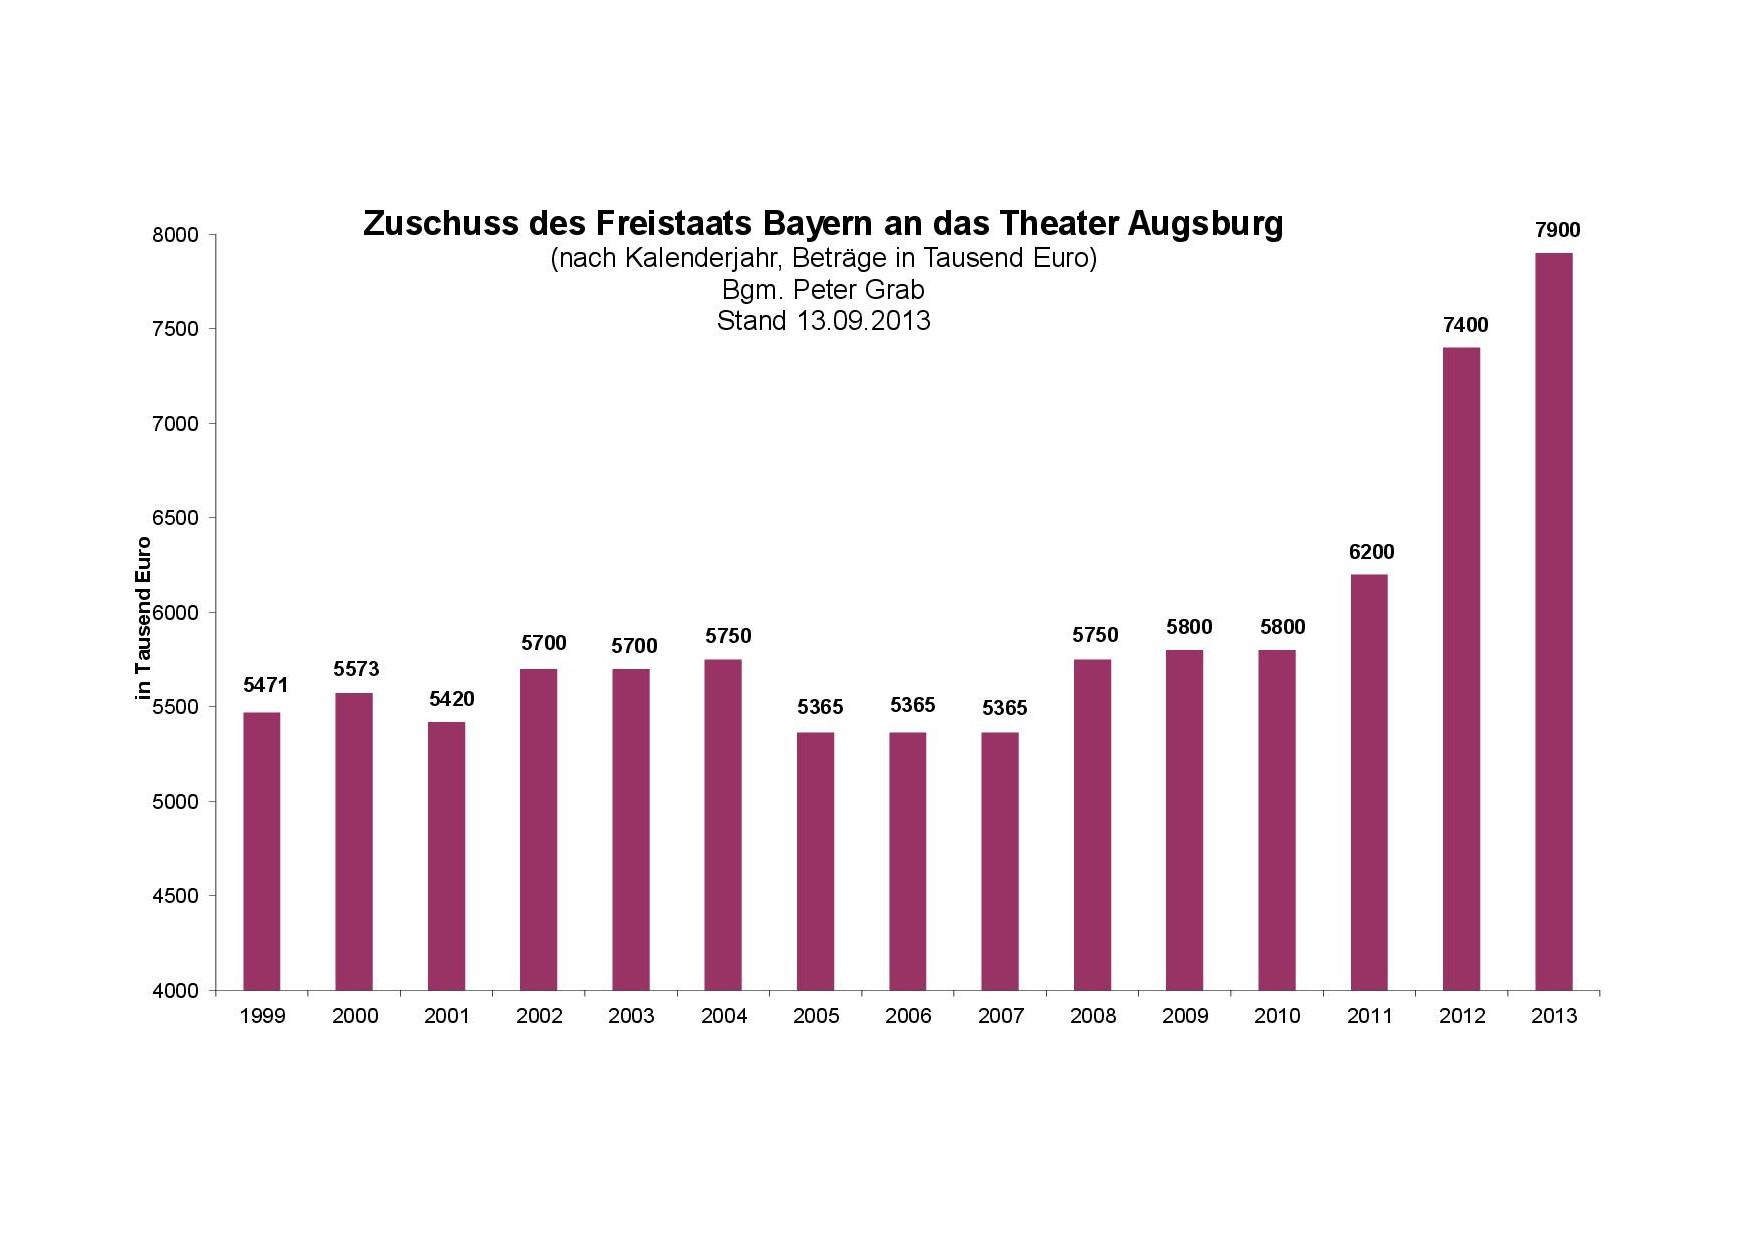 Zuschuss Freistaat Bayern an Theater Augsburg, Stand 13.9.2013